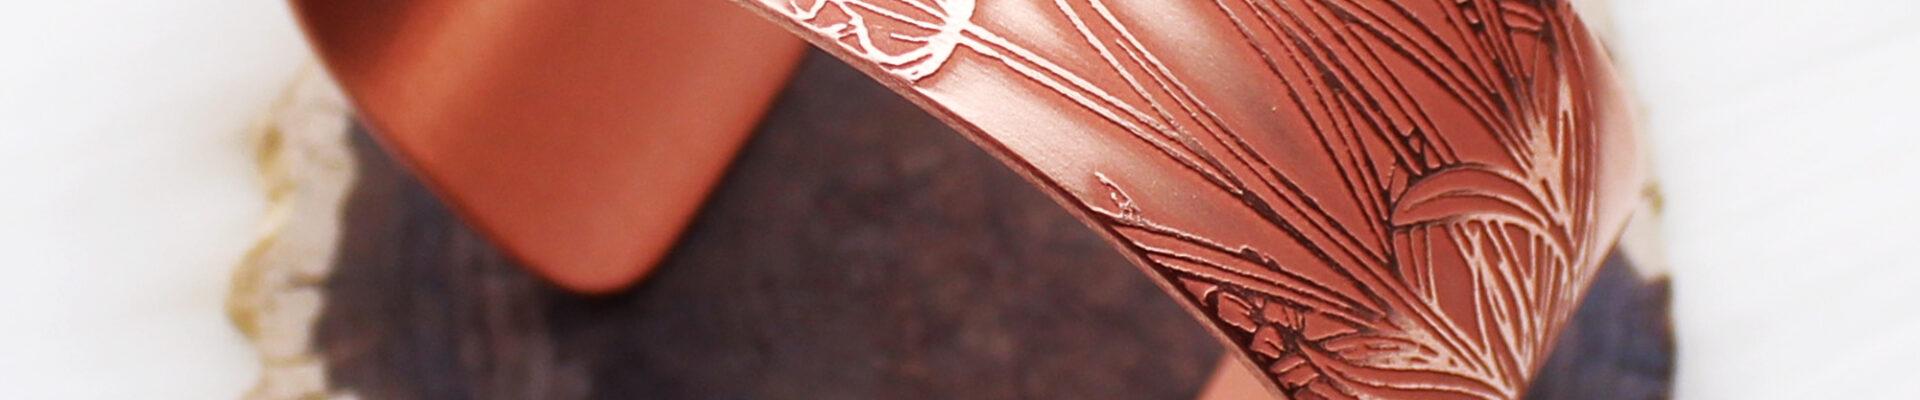 Lavender, Copper Cuff, Handmade Bracelet